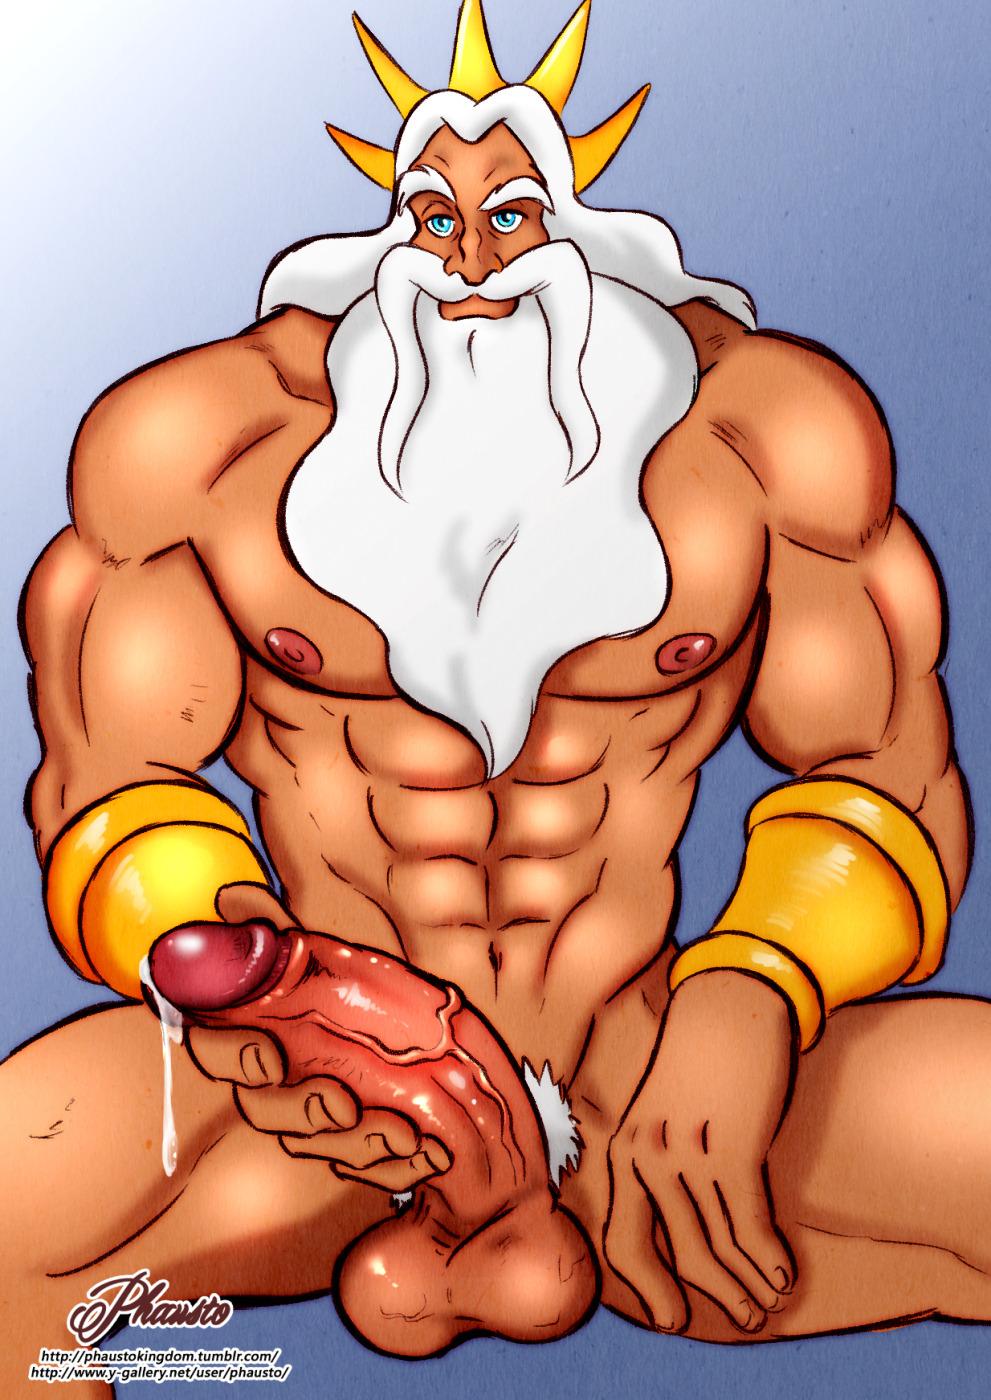 1_boy 1_human 1_male 1boy 1male 1man abs beard big_penis disney erect_penis erection huge_penis human king_triton mature mature_male muscle muscles penis phausto precum testicle testicles